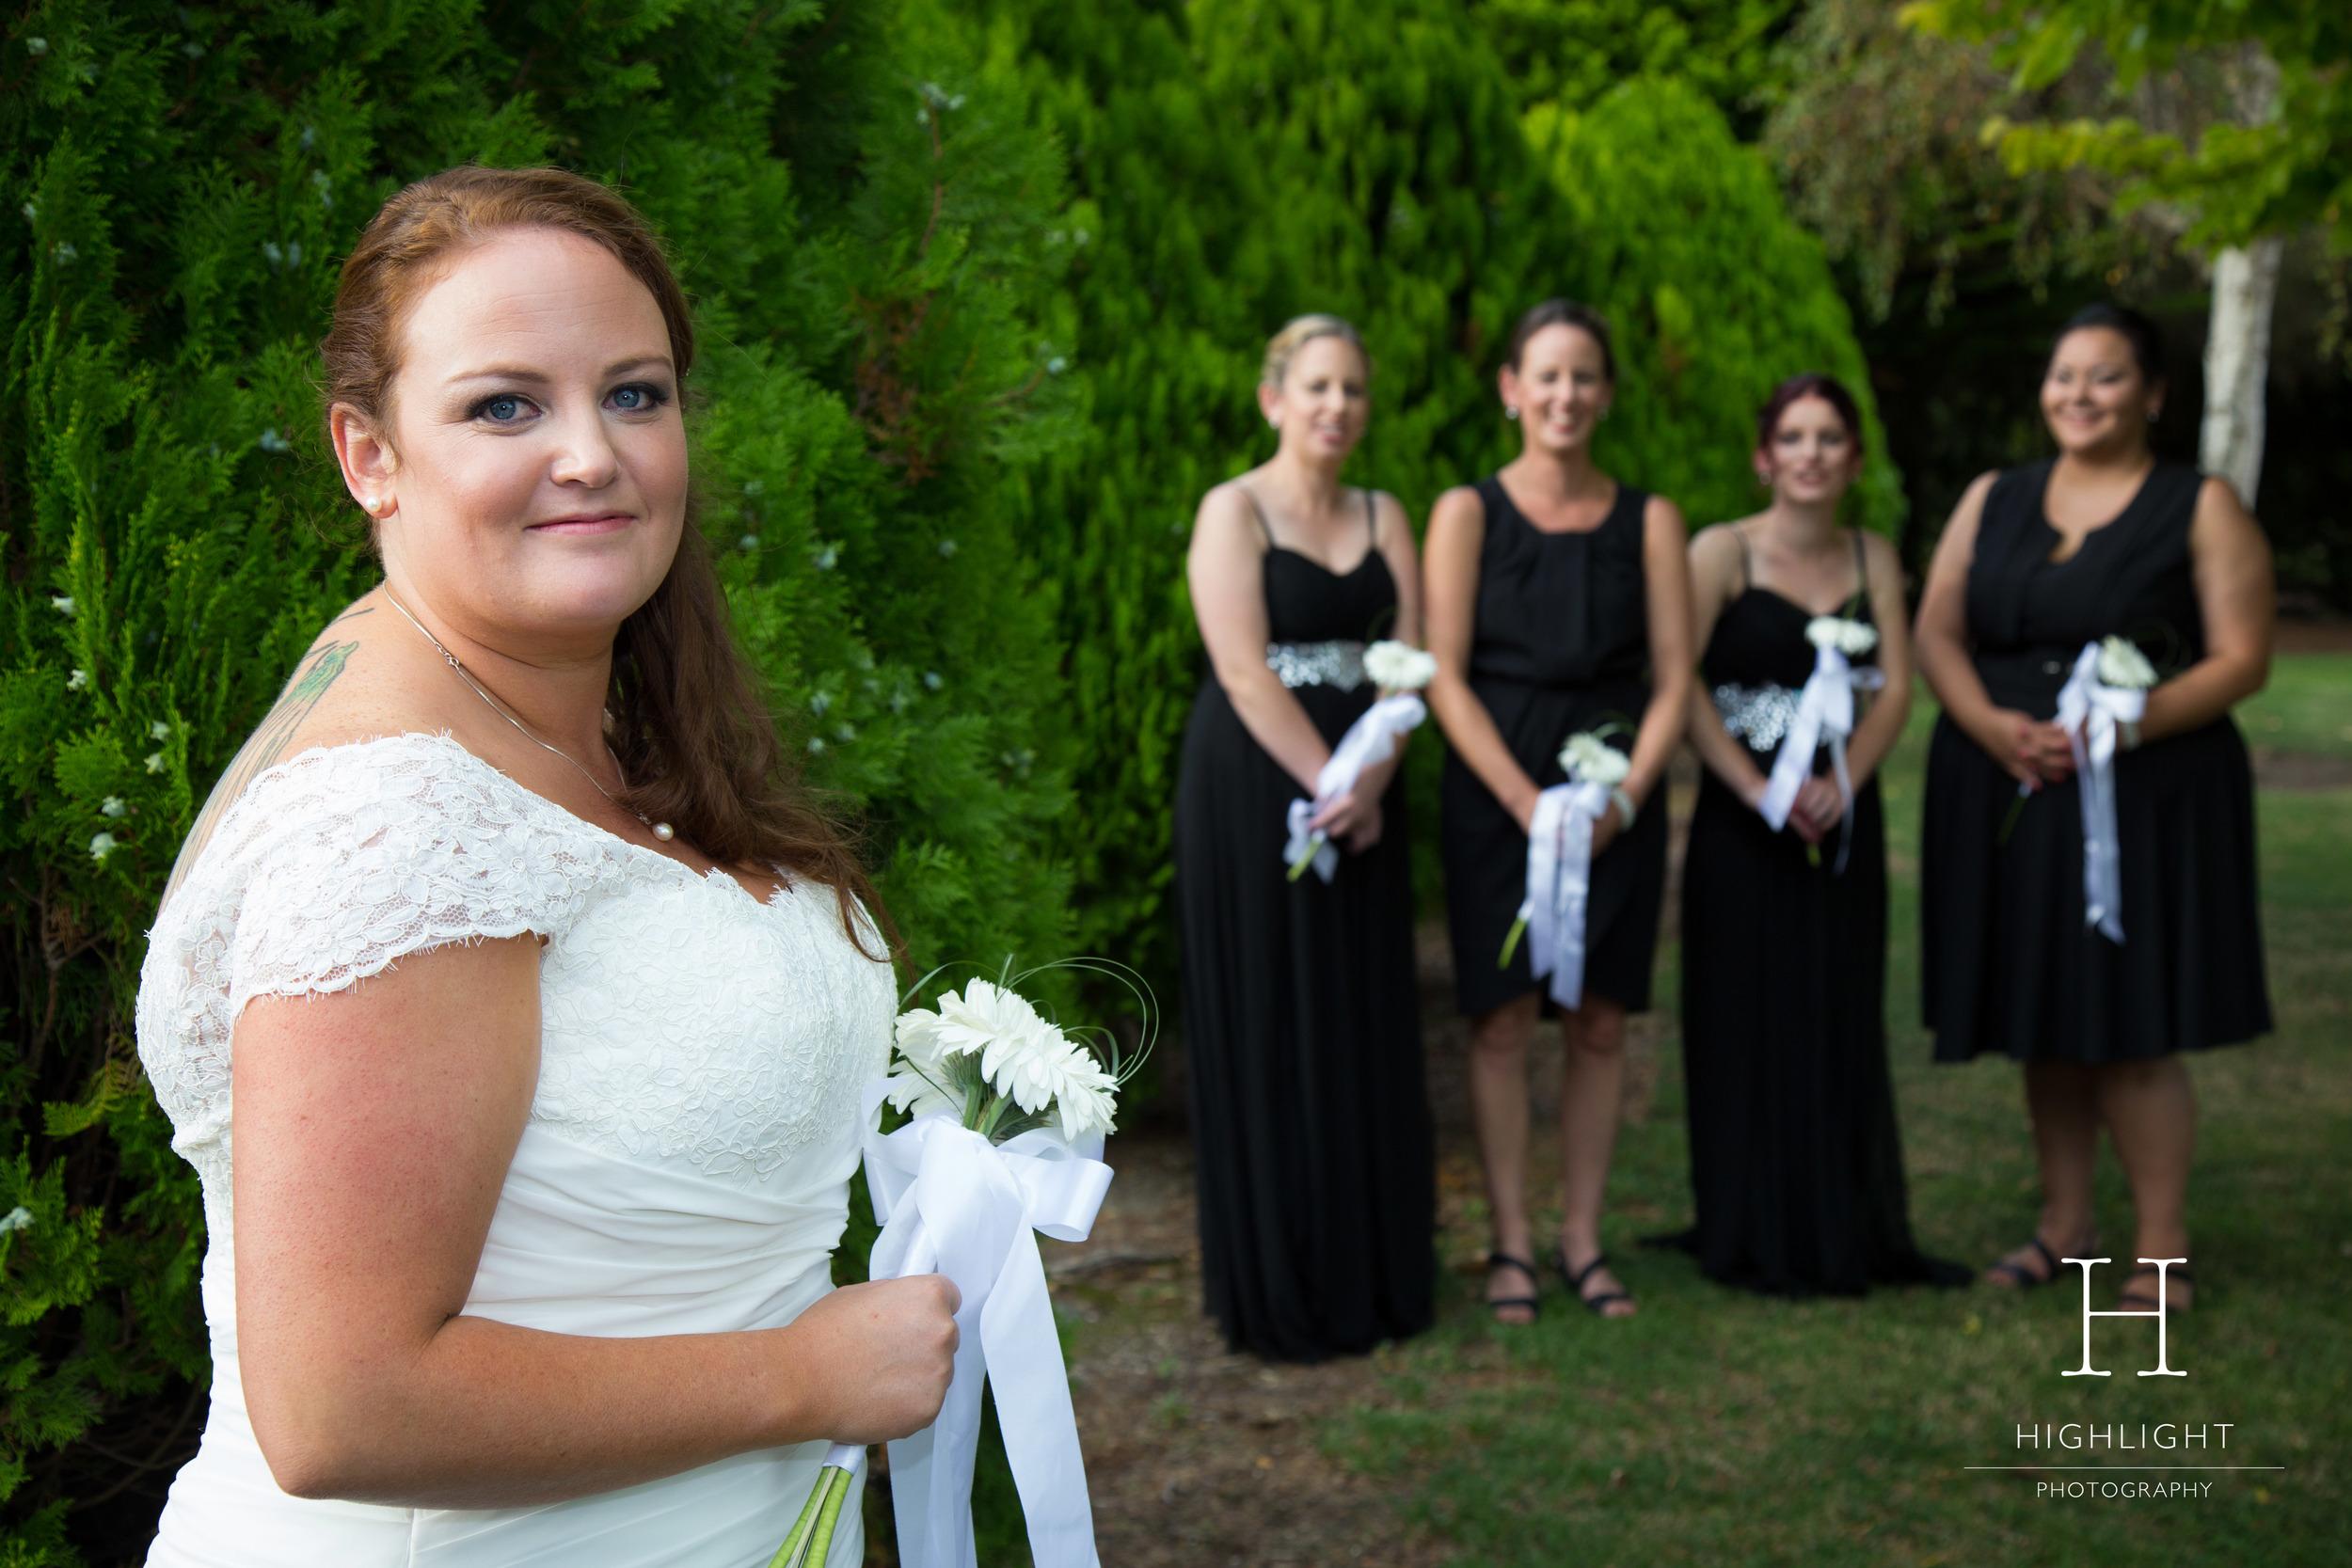 highlight_wedding_photography_palmerston-north_masterton.jpg